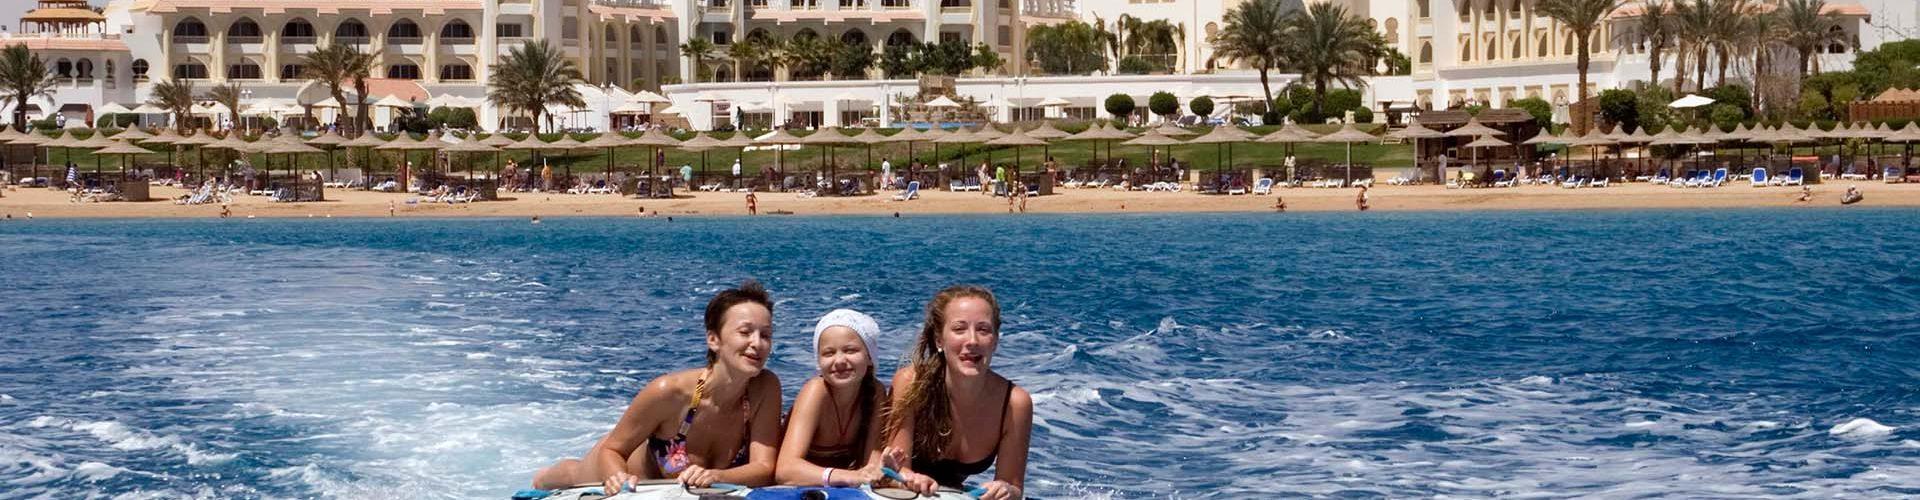 Hurghada Red Sea Egypt Sun Beach Mood Gezi Deniz Tur Tour Boat Flight Cheap Deal Ucuz Ideal